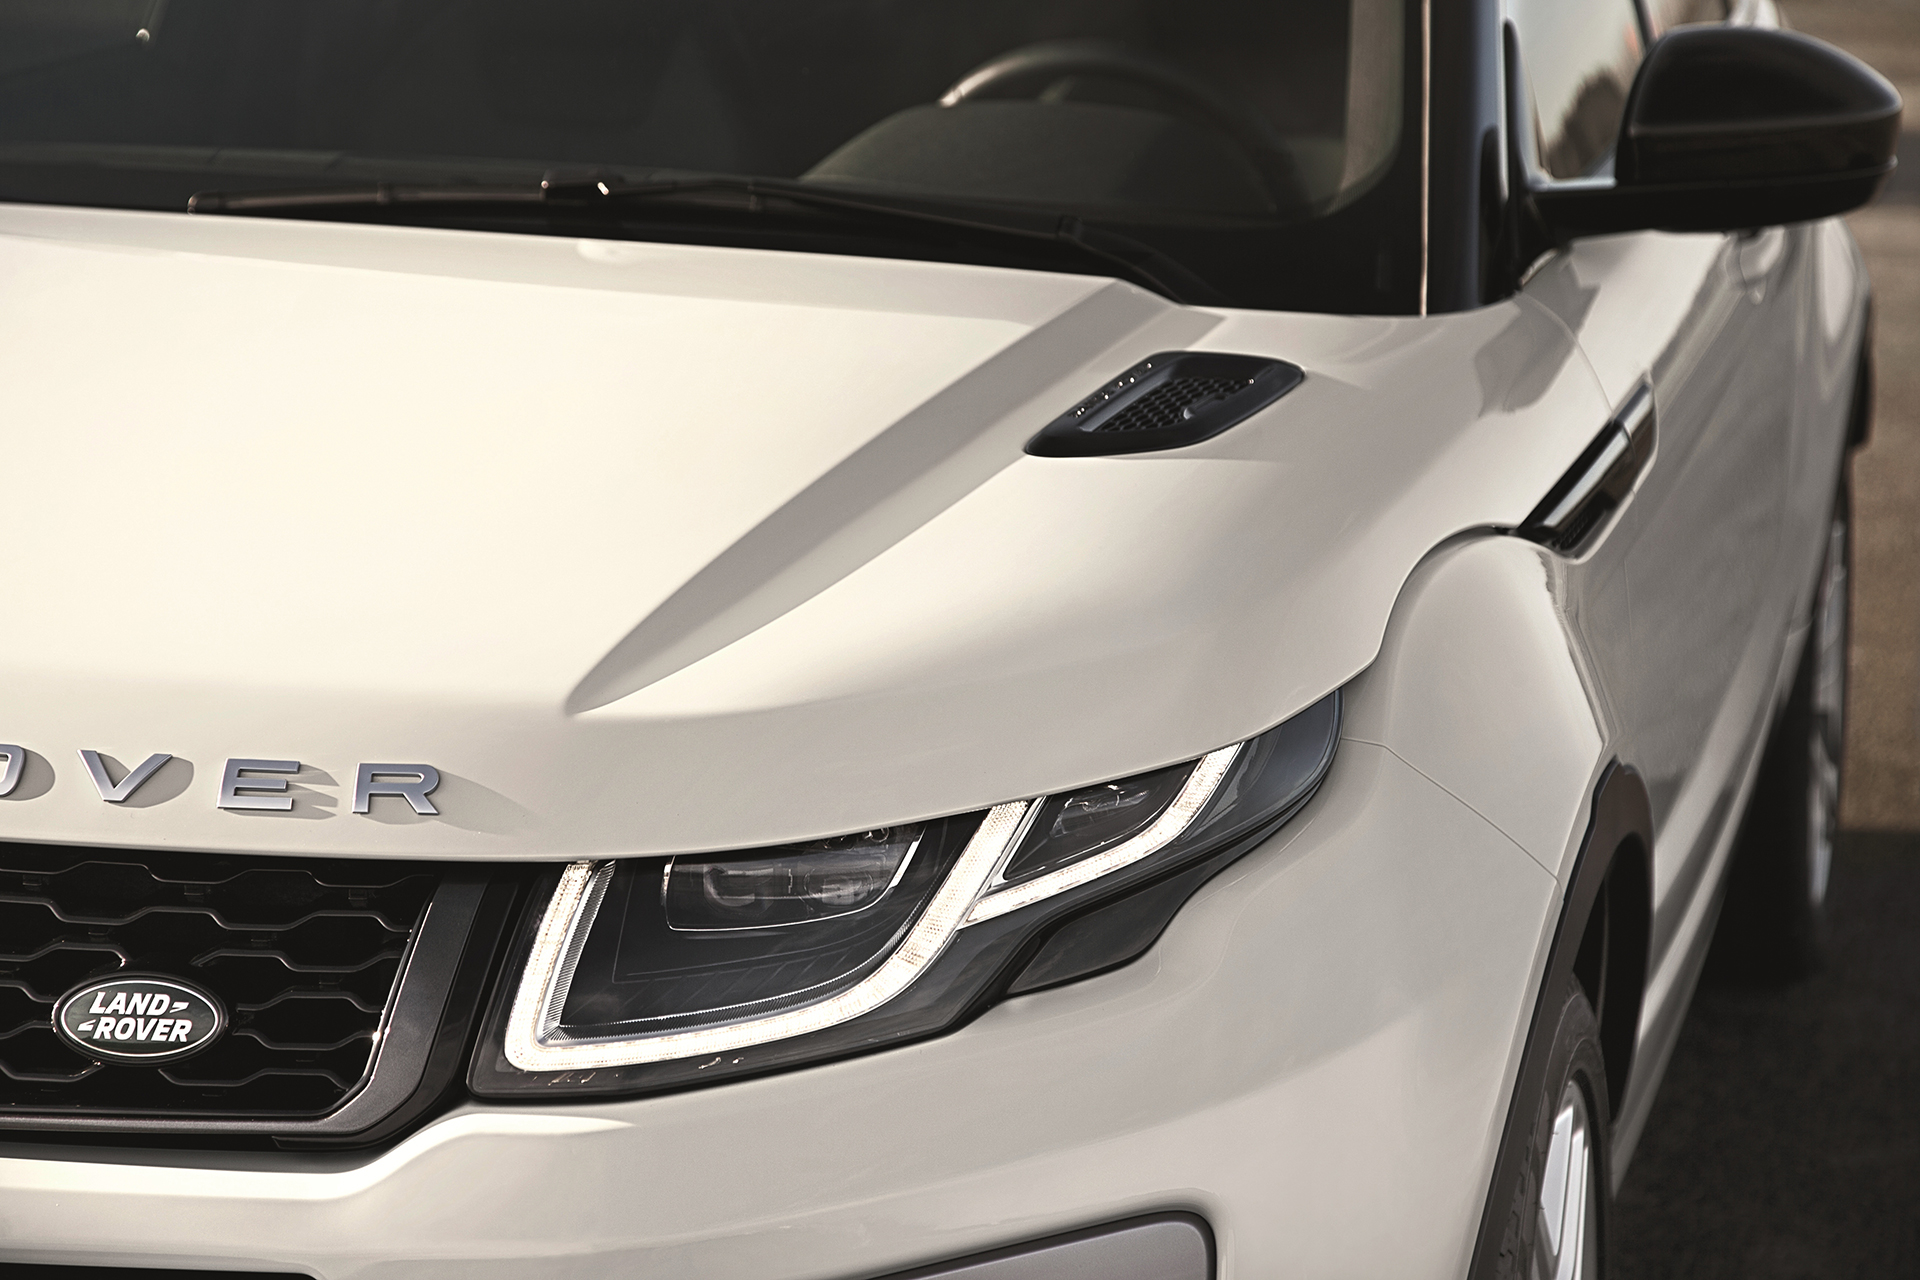 Land Rover Range Rover Evoque - 2016 - front / avant - LED